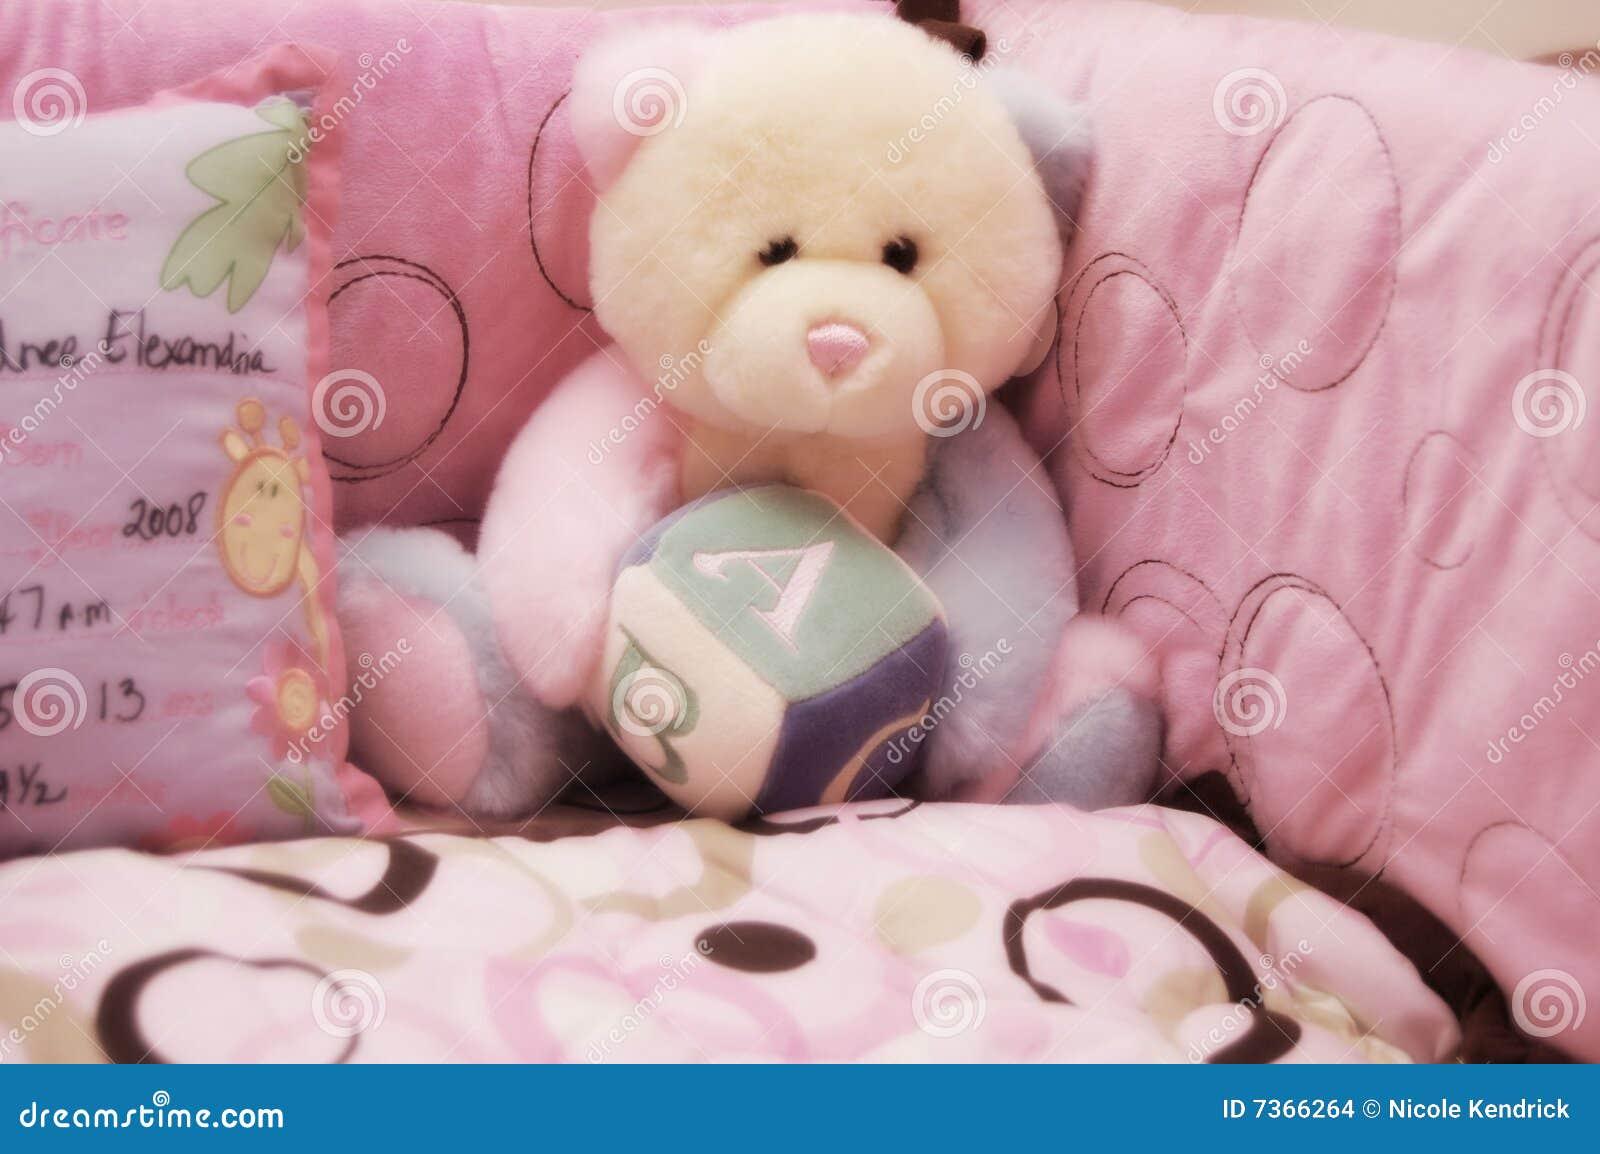 Baby Girl Crib And Teddy Bear Stock Images Image 7366264